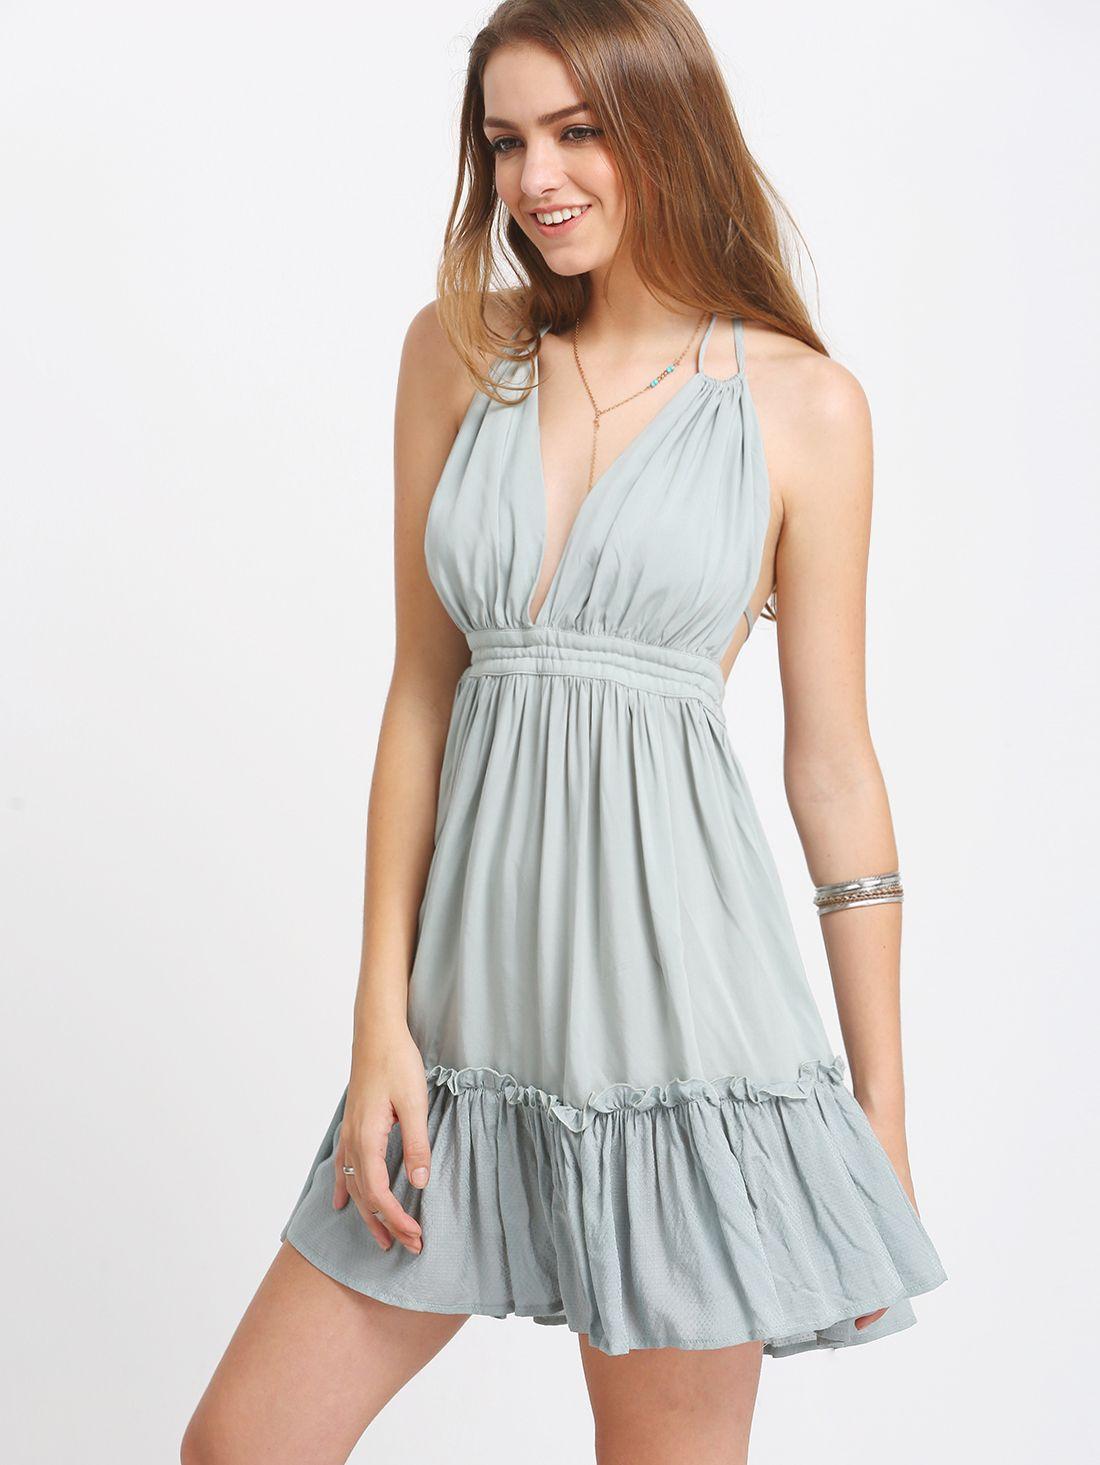 Cómpralo ya grey blue halter backless pleated dress blue sexy